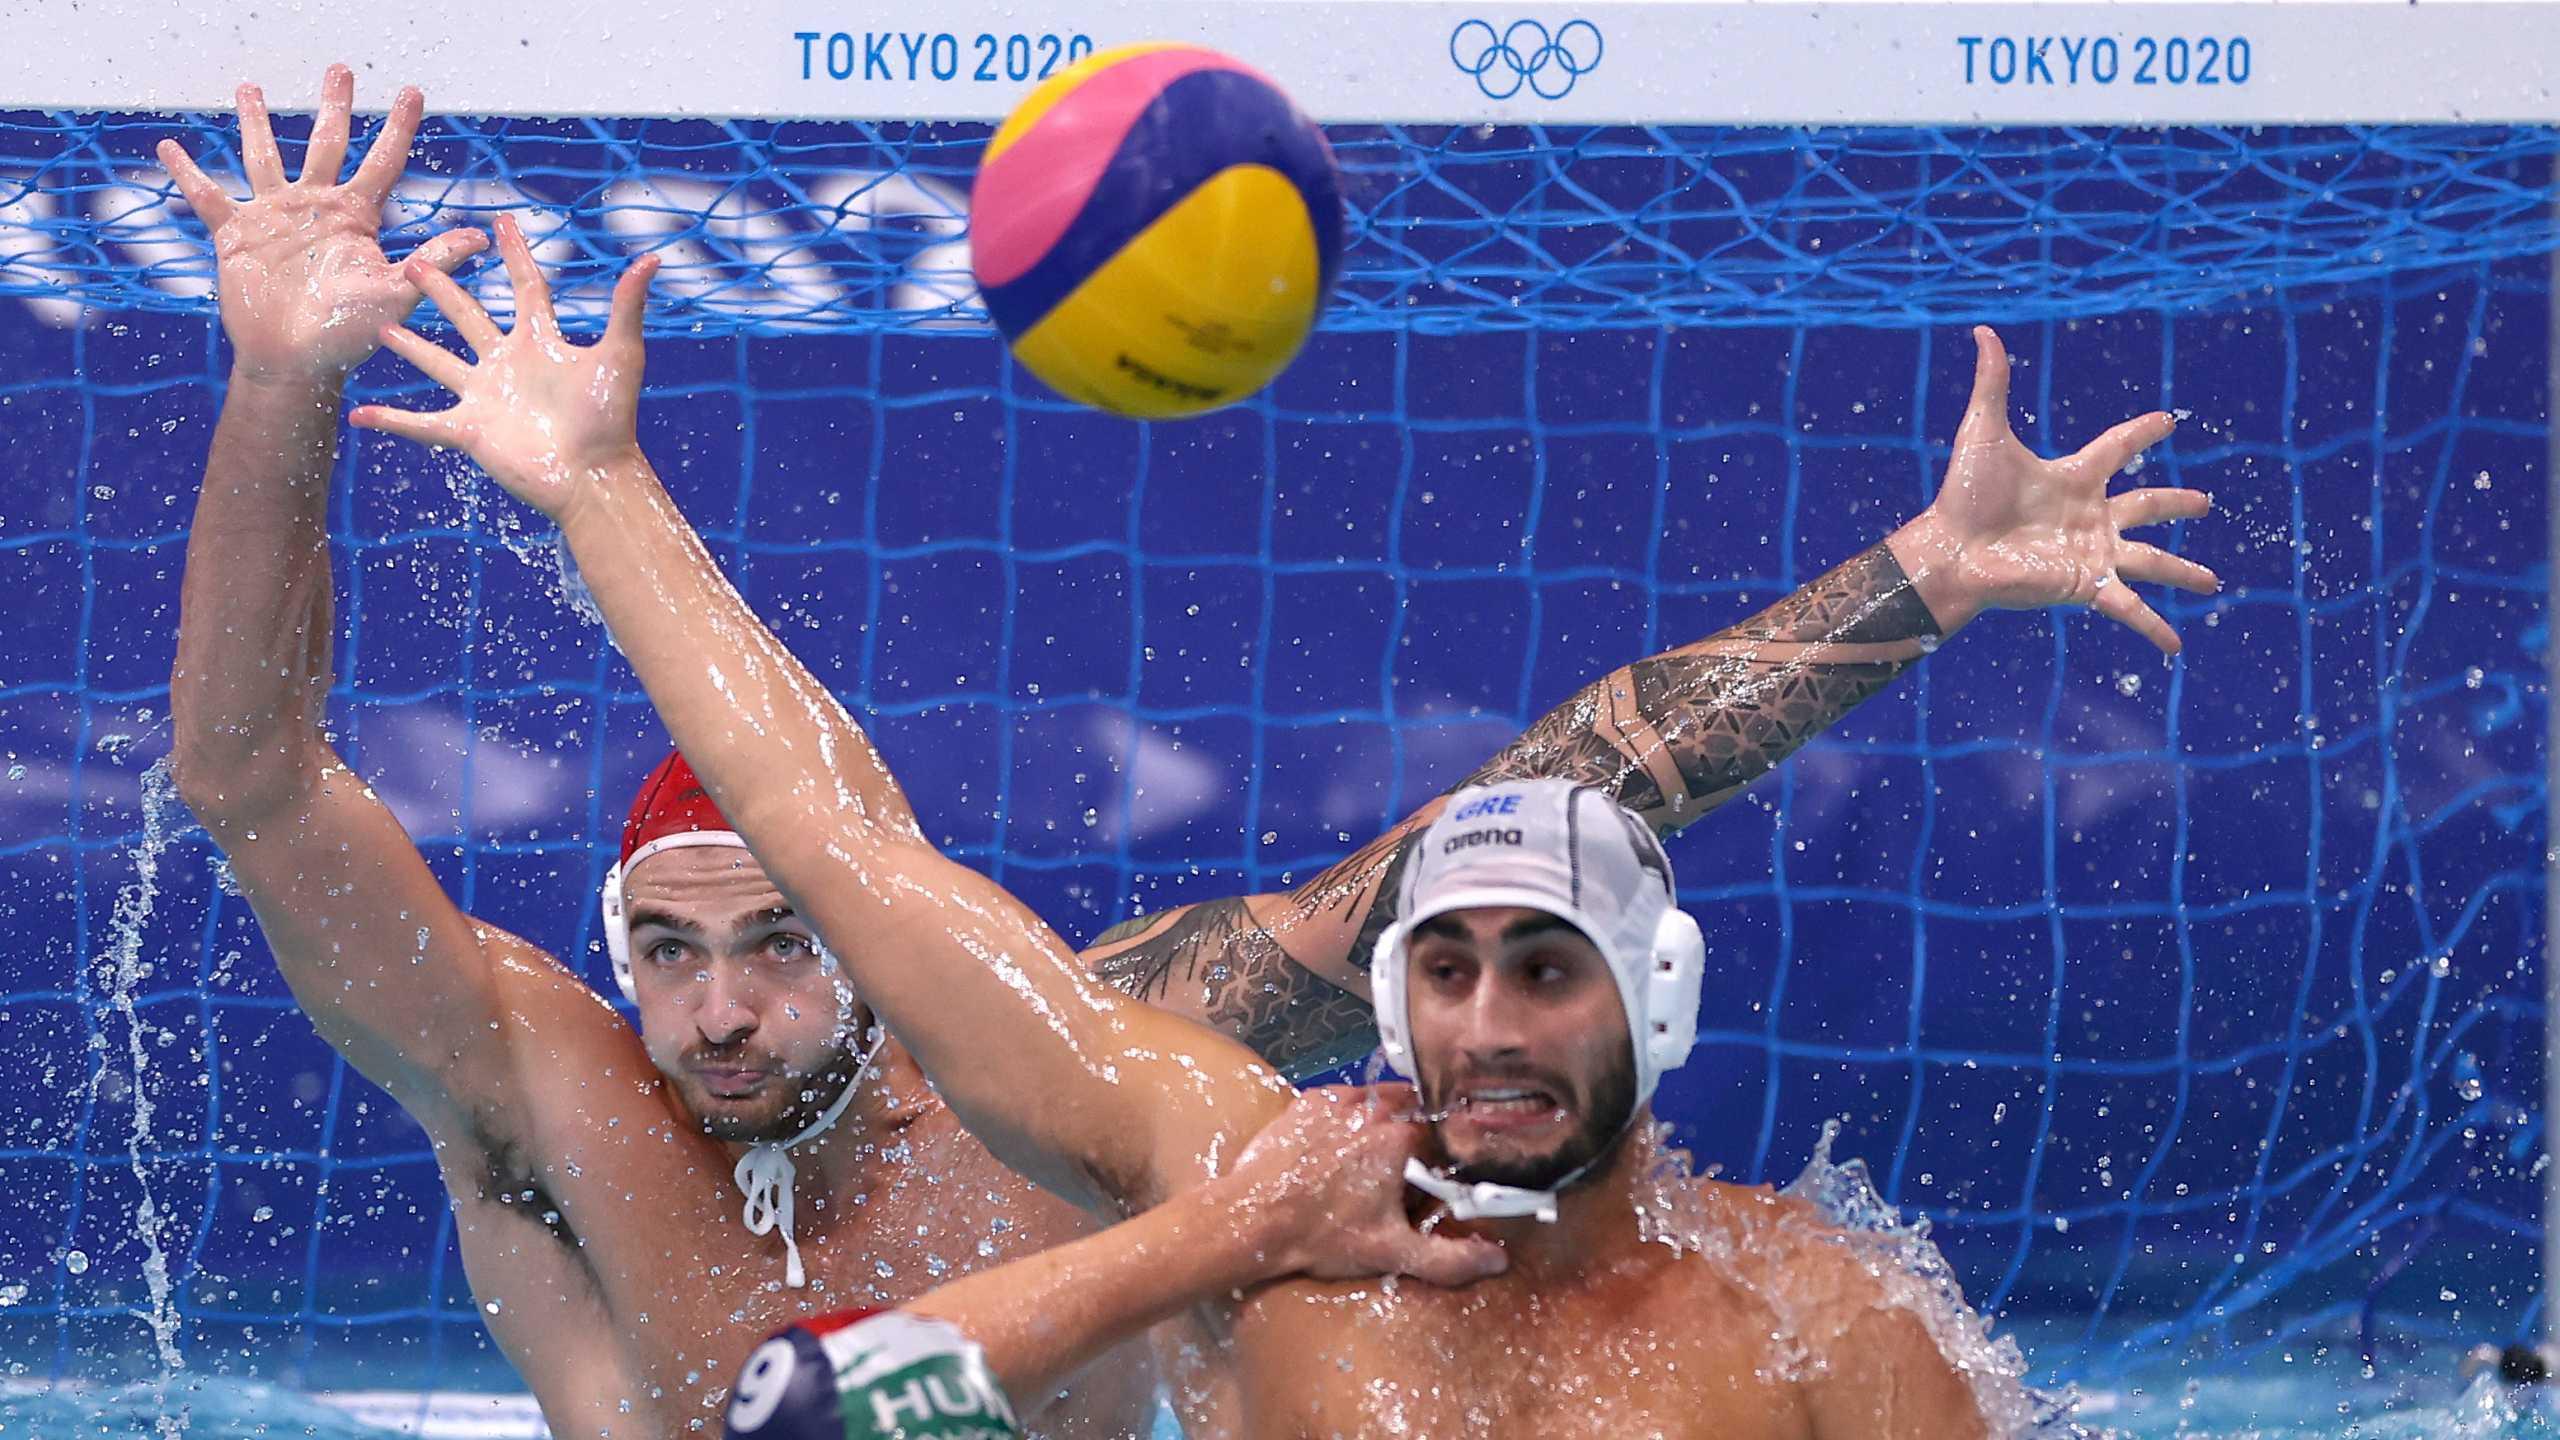 Eλλάδα – Ουγγαρία 9-6 ΤΕΛΙΚΟ: Στον τελικό η «γαλανόλευκη» που πάει για το χρυσό στους Ολυμπιακούς Αγώνες